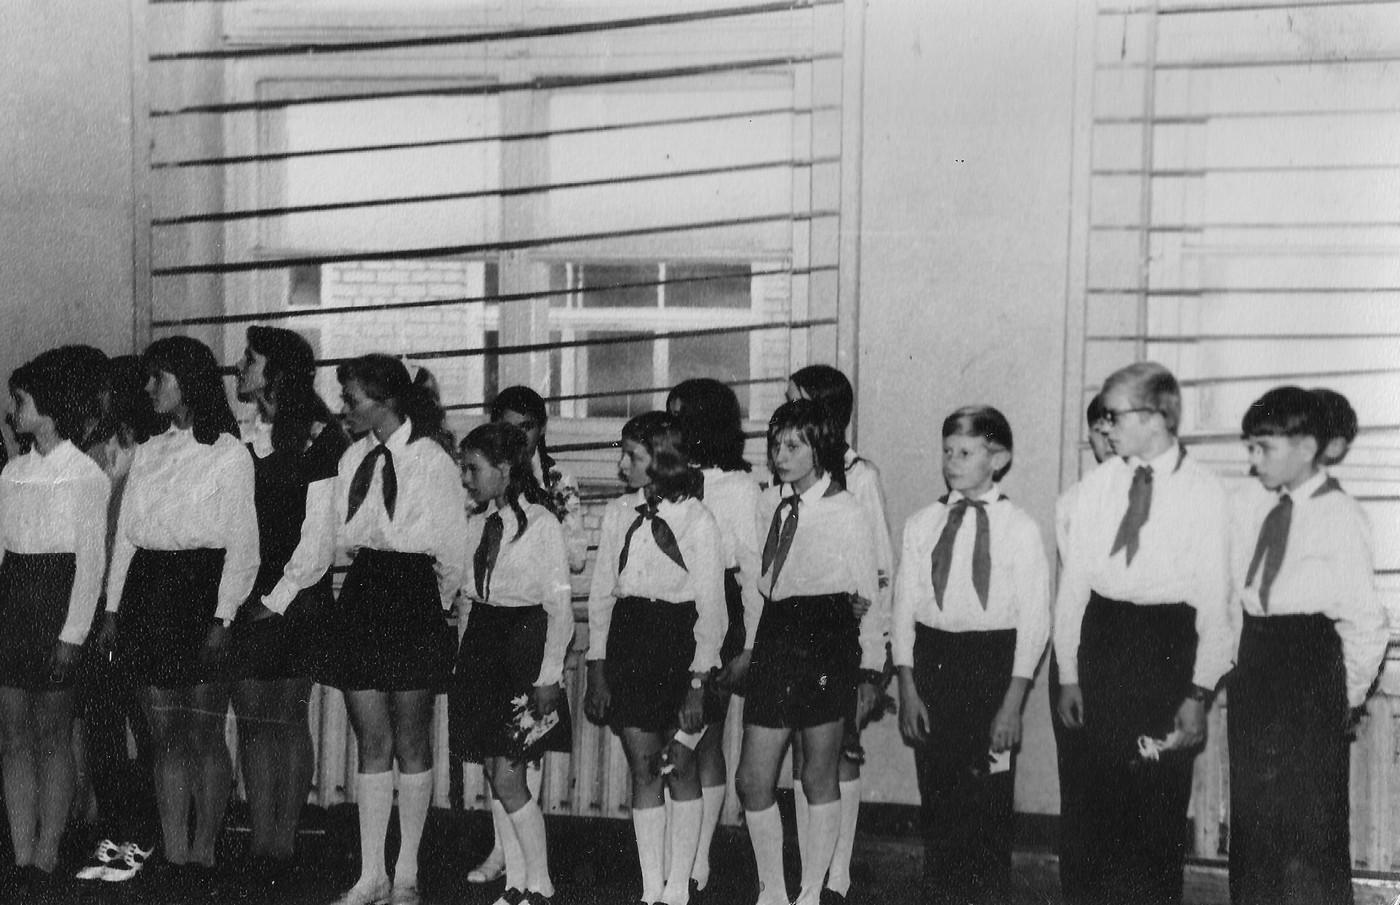 Skolēni ierindas skatē 1970-tie gadi